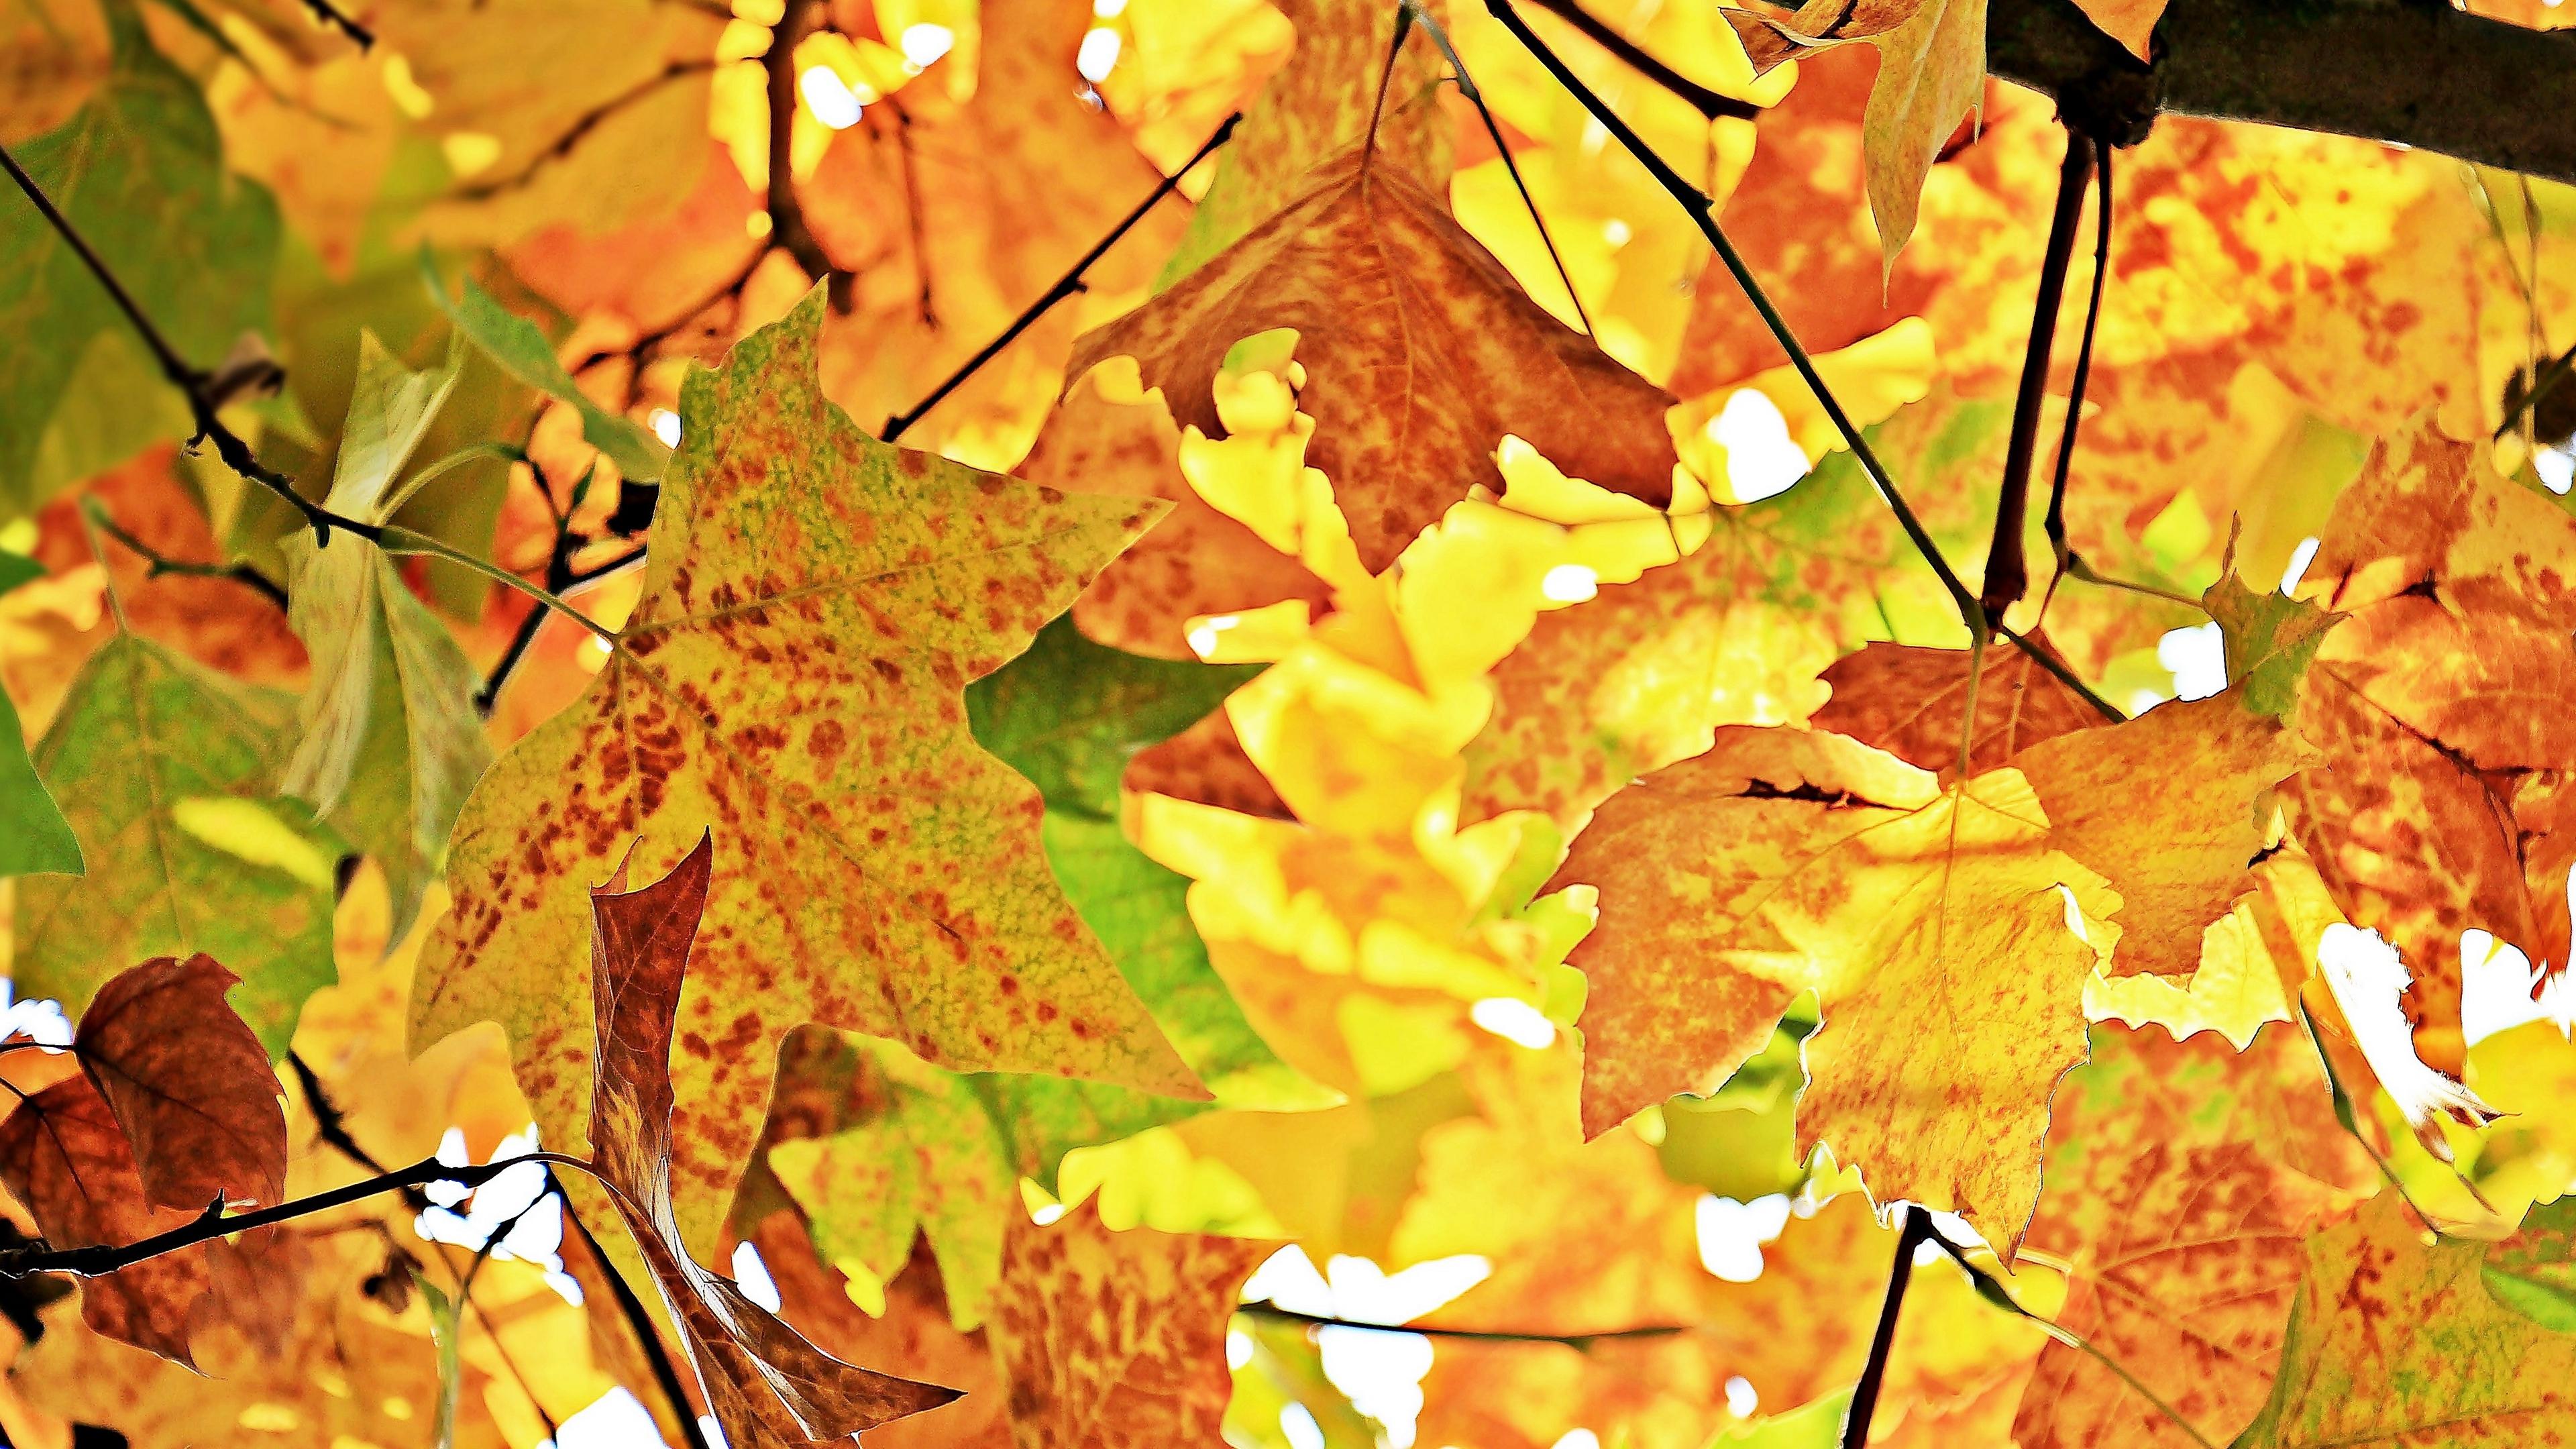 autumn leaves branches tree maple 4k 1541113992 - autumn, leaves, branches, tree, maple 4k - Leaves, branches, Autumn